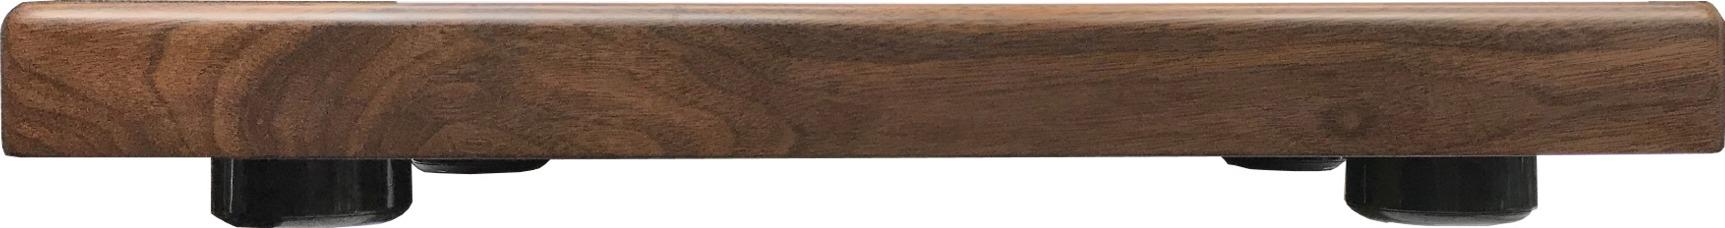 AIRBOW - WOODBASE(52cm×72cm・1枚)《JP》【納期かかります・受注後一ヶ月程度】